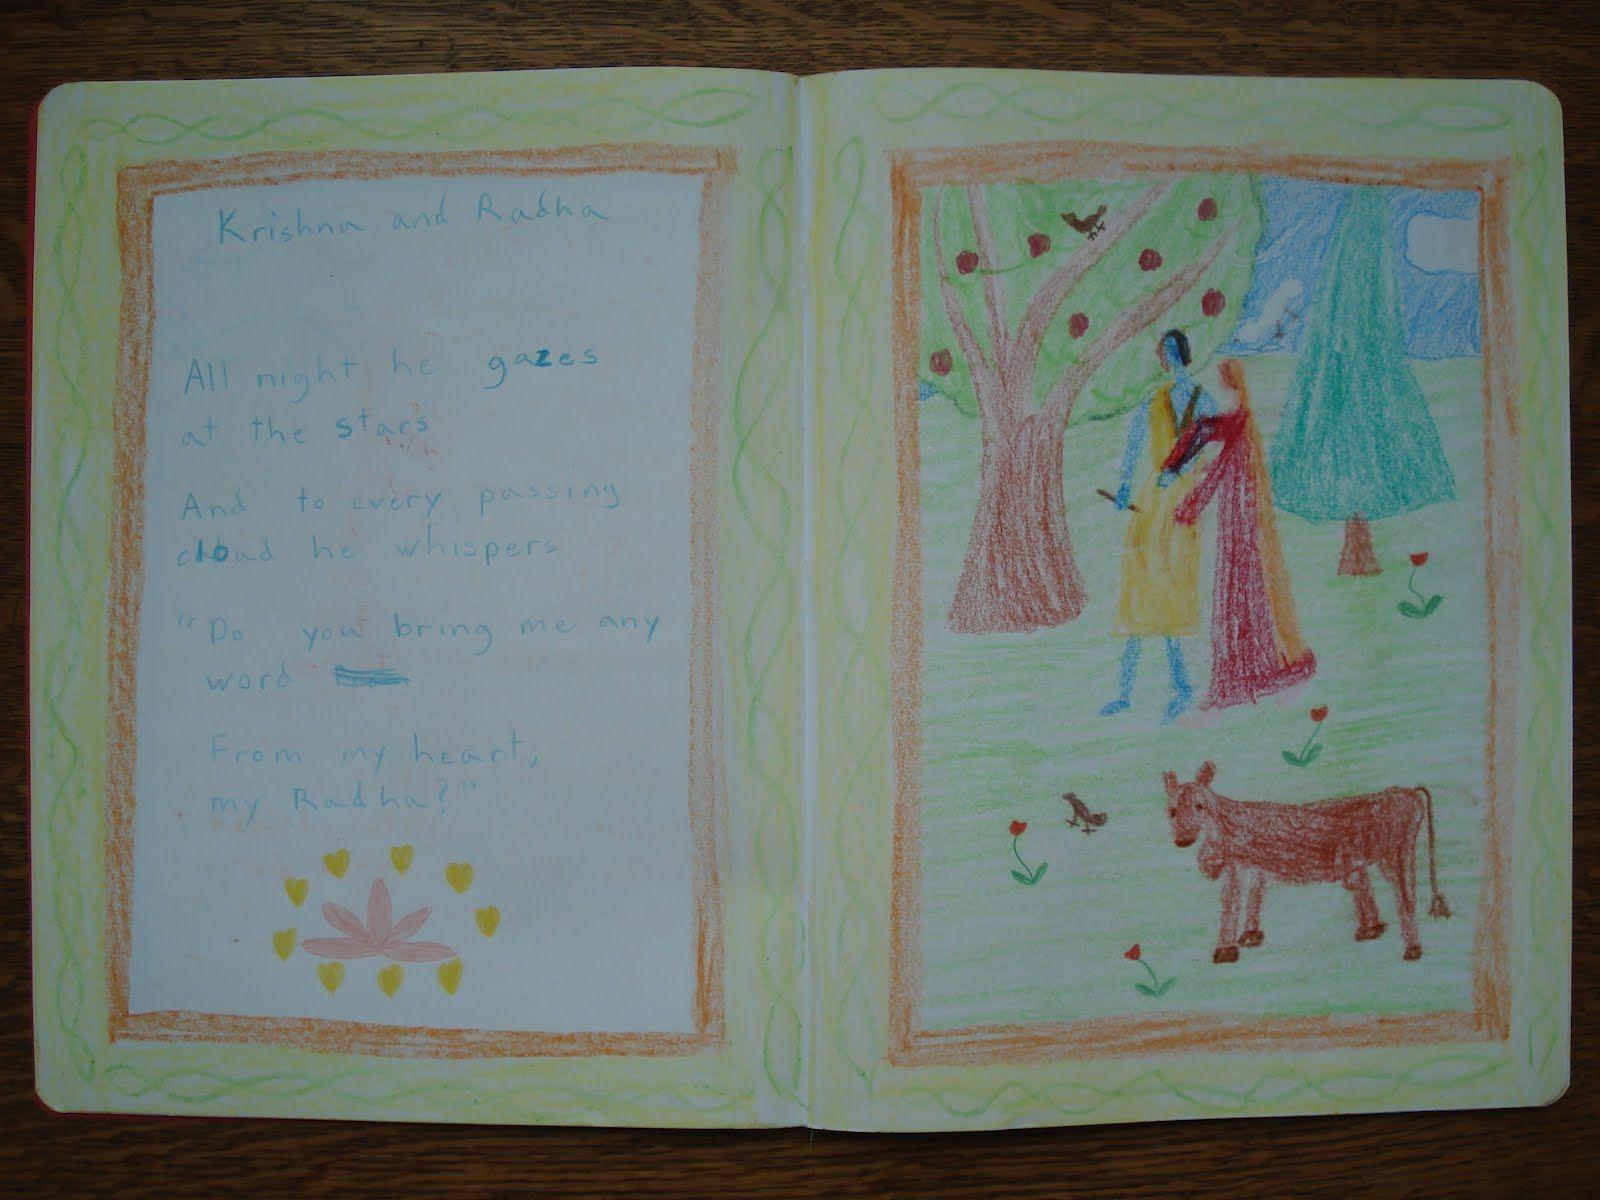 http://heirloomseasons.blogspot.com/2012/02/waldorf-fifth-grade-ancient-india.html